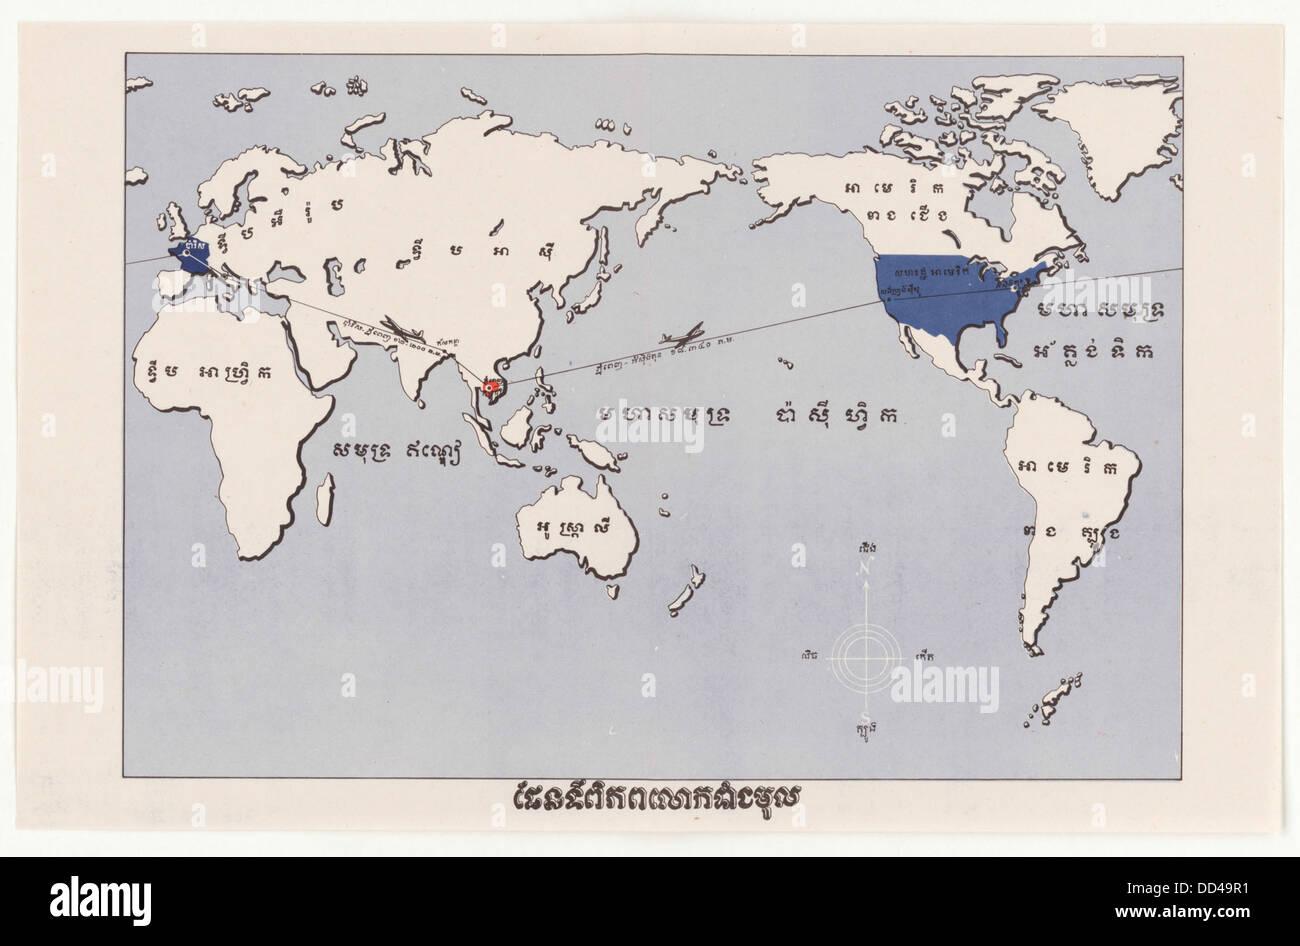 World Map - - 5730165 - Stock Image